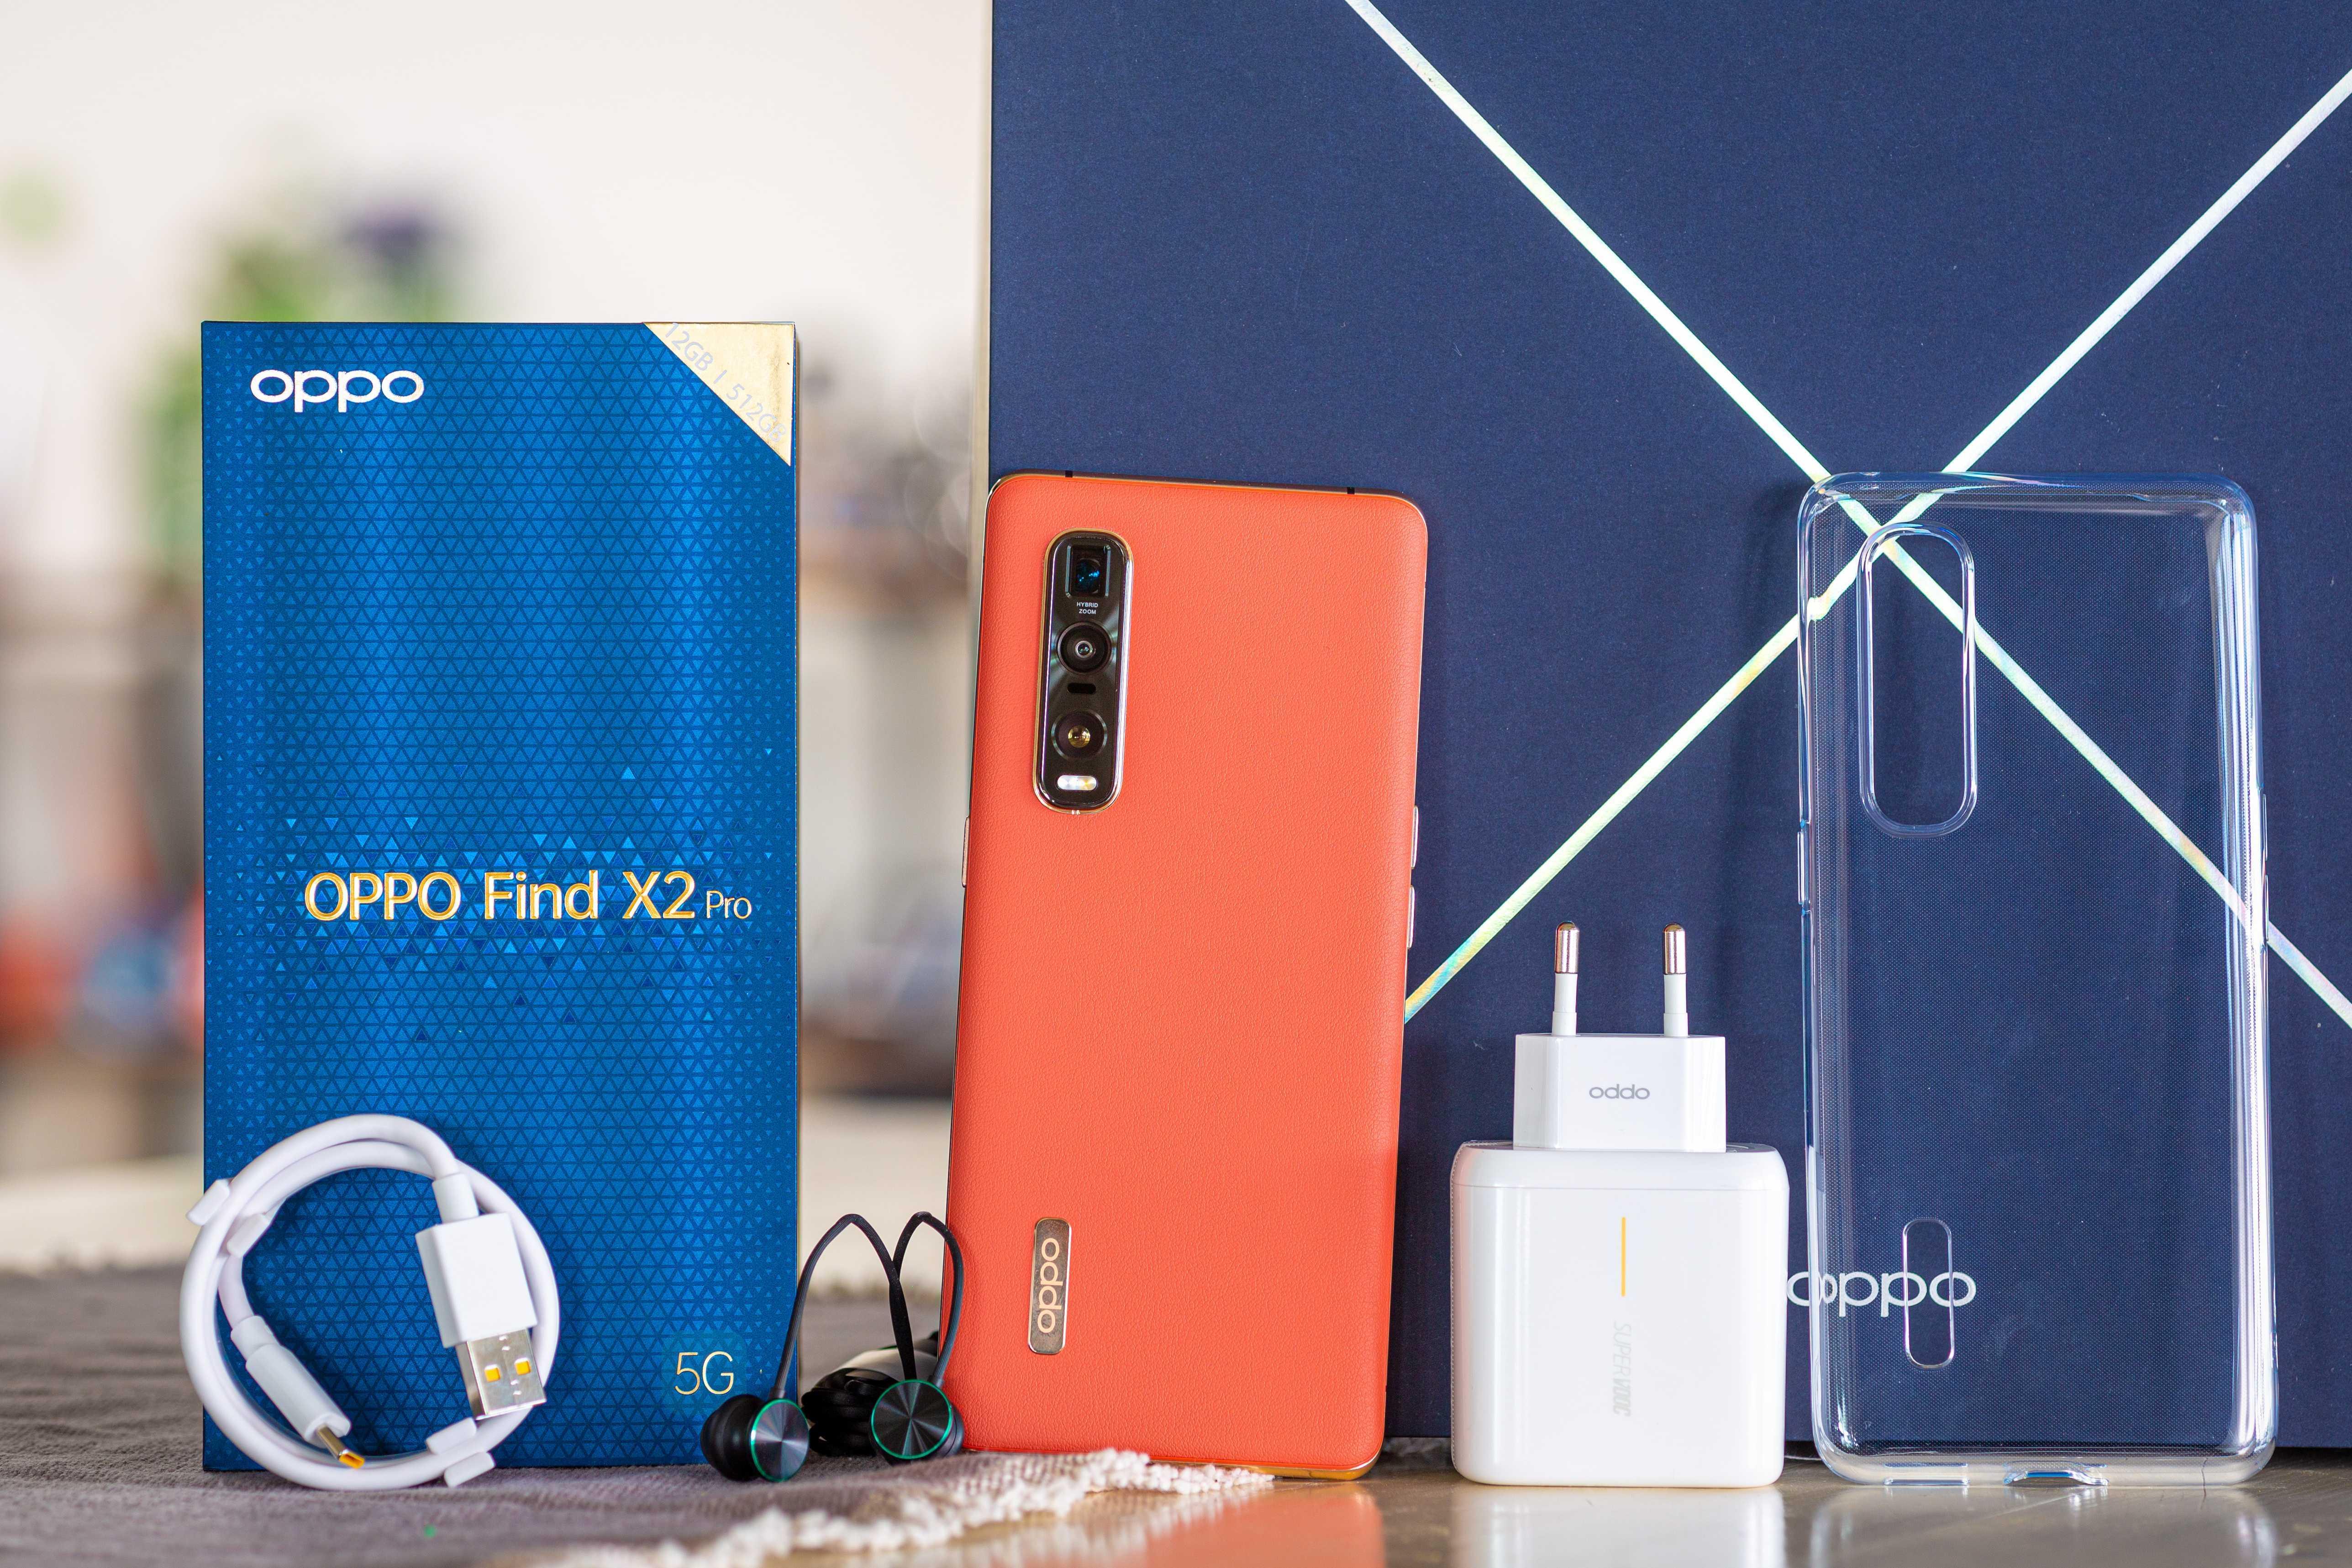 Oppo представила линейку смартфонов find x2 ► последние новости